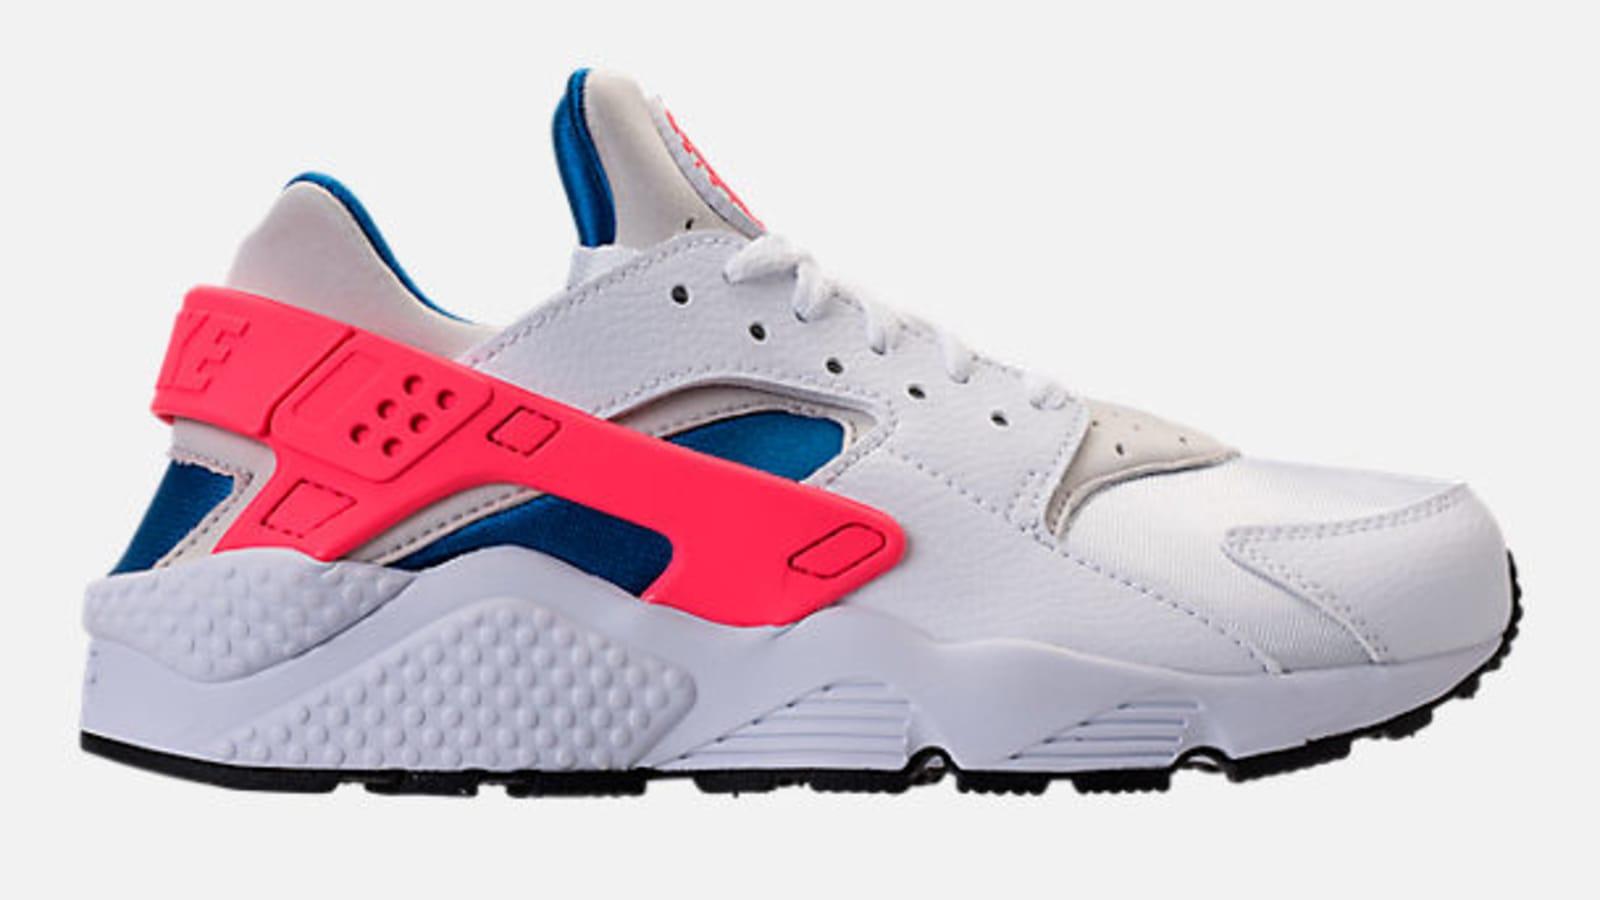 68366a026e35 Adidas NMD CS1 - Sneaker Sales July 13